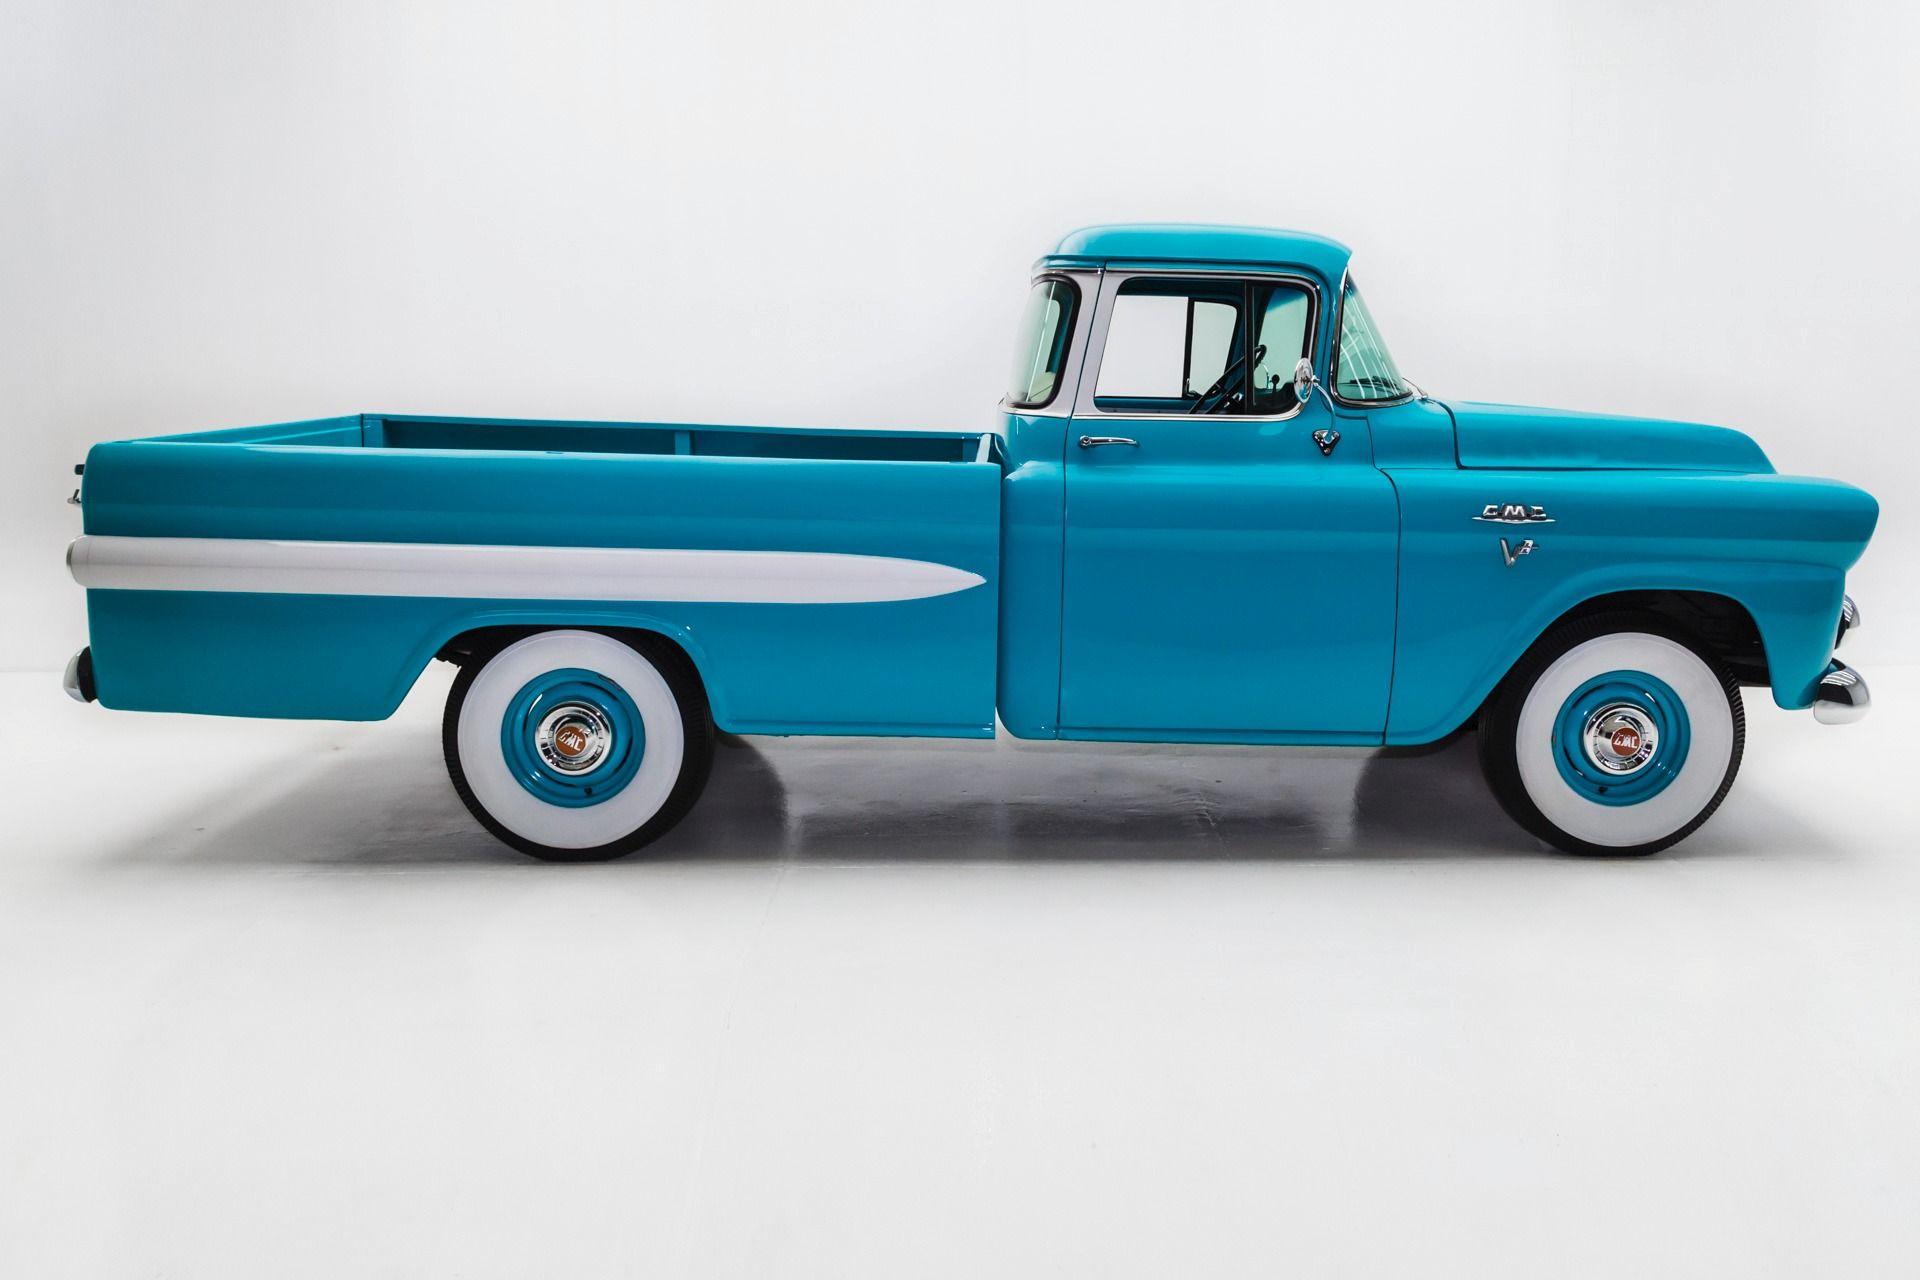 Pickup Trucks, Gmc Pickup, Window, Big, Manual, Textbook, Windows, User  Guide, Ram Trucks